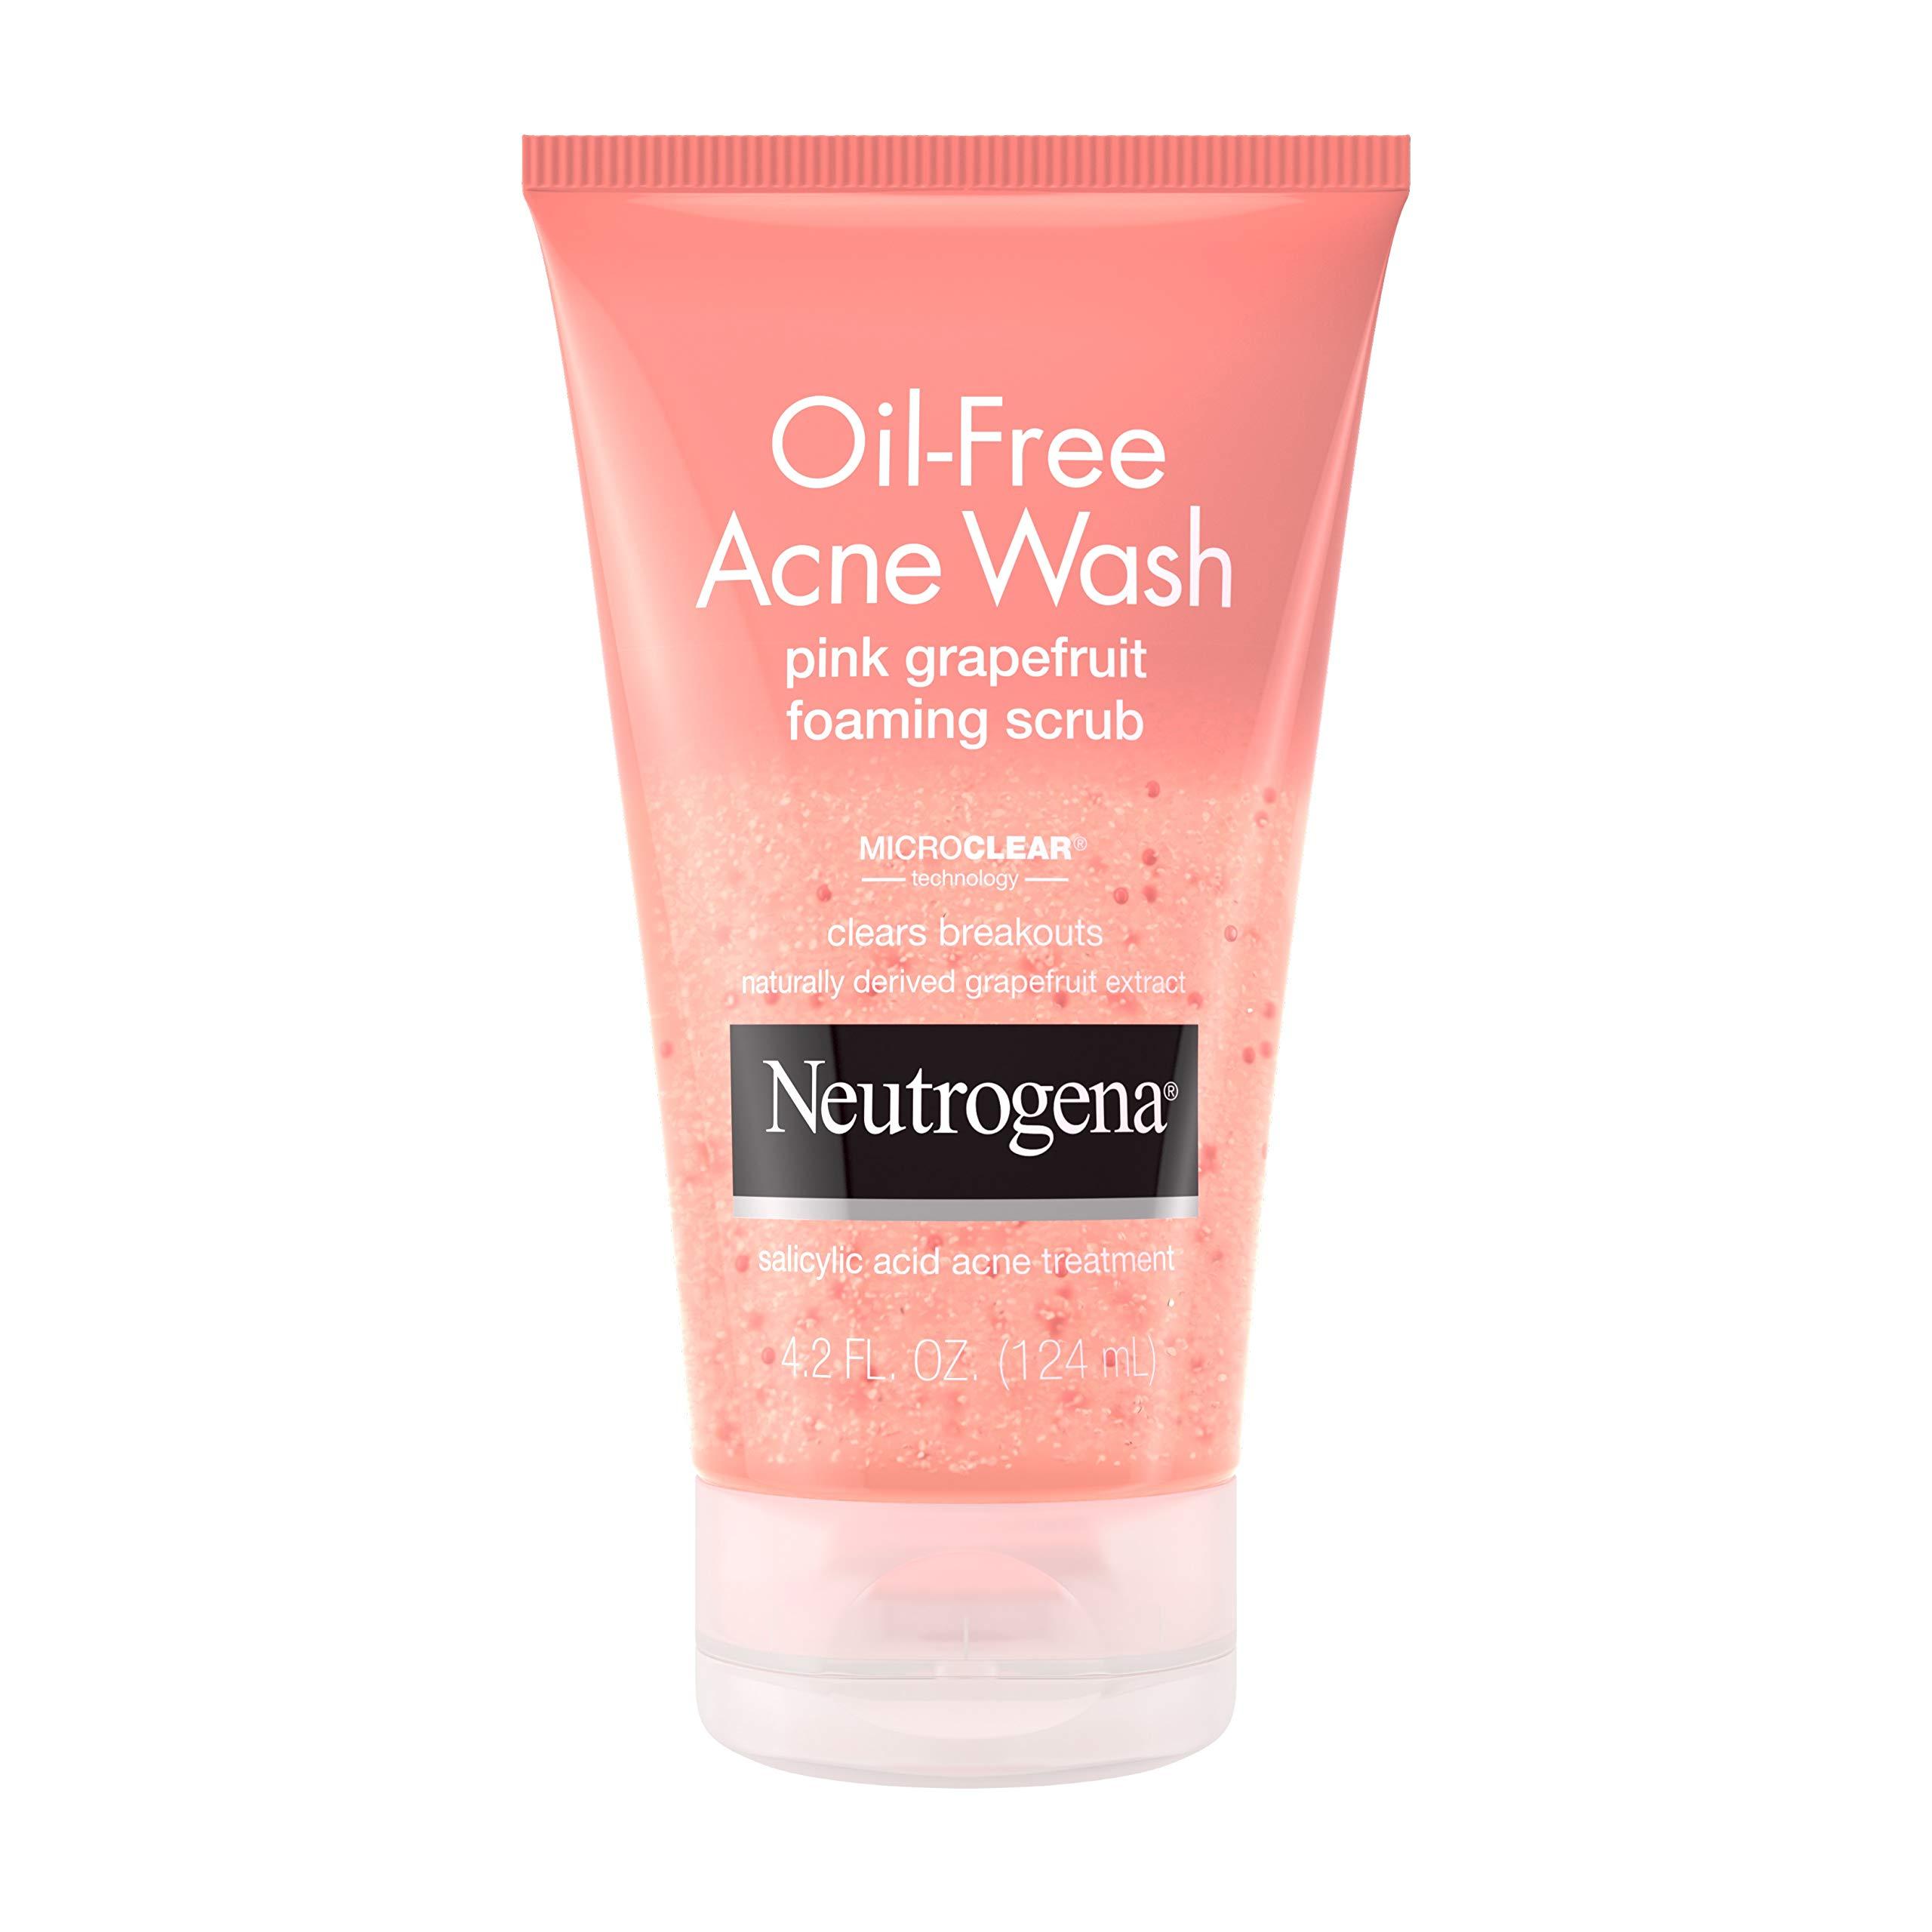 Neutrogena Oil Free Pink Grapefruit Acne Face Wash with Vitamin C, Salicylic Acid Acne Treatment Medicine, Gentle Foaming Vitamin C Facial Scrub to Treat and Prevent Breakouts, 4.2 fl. oz